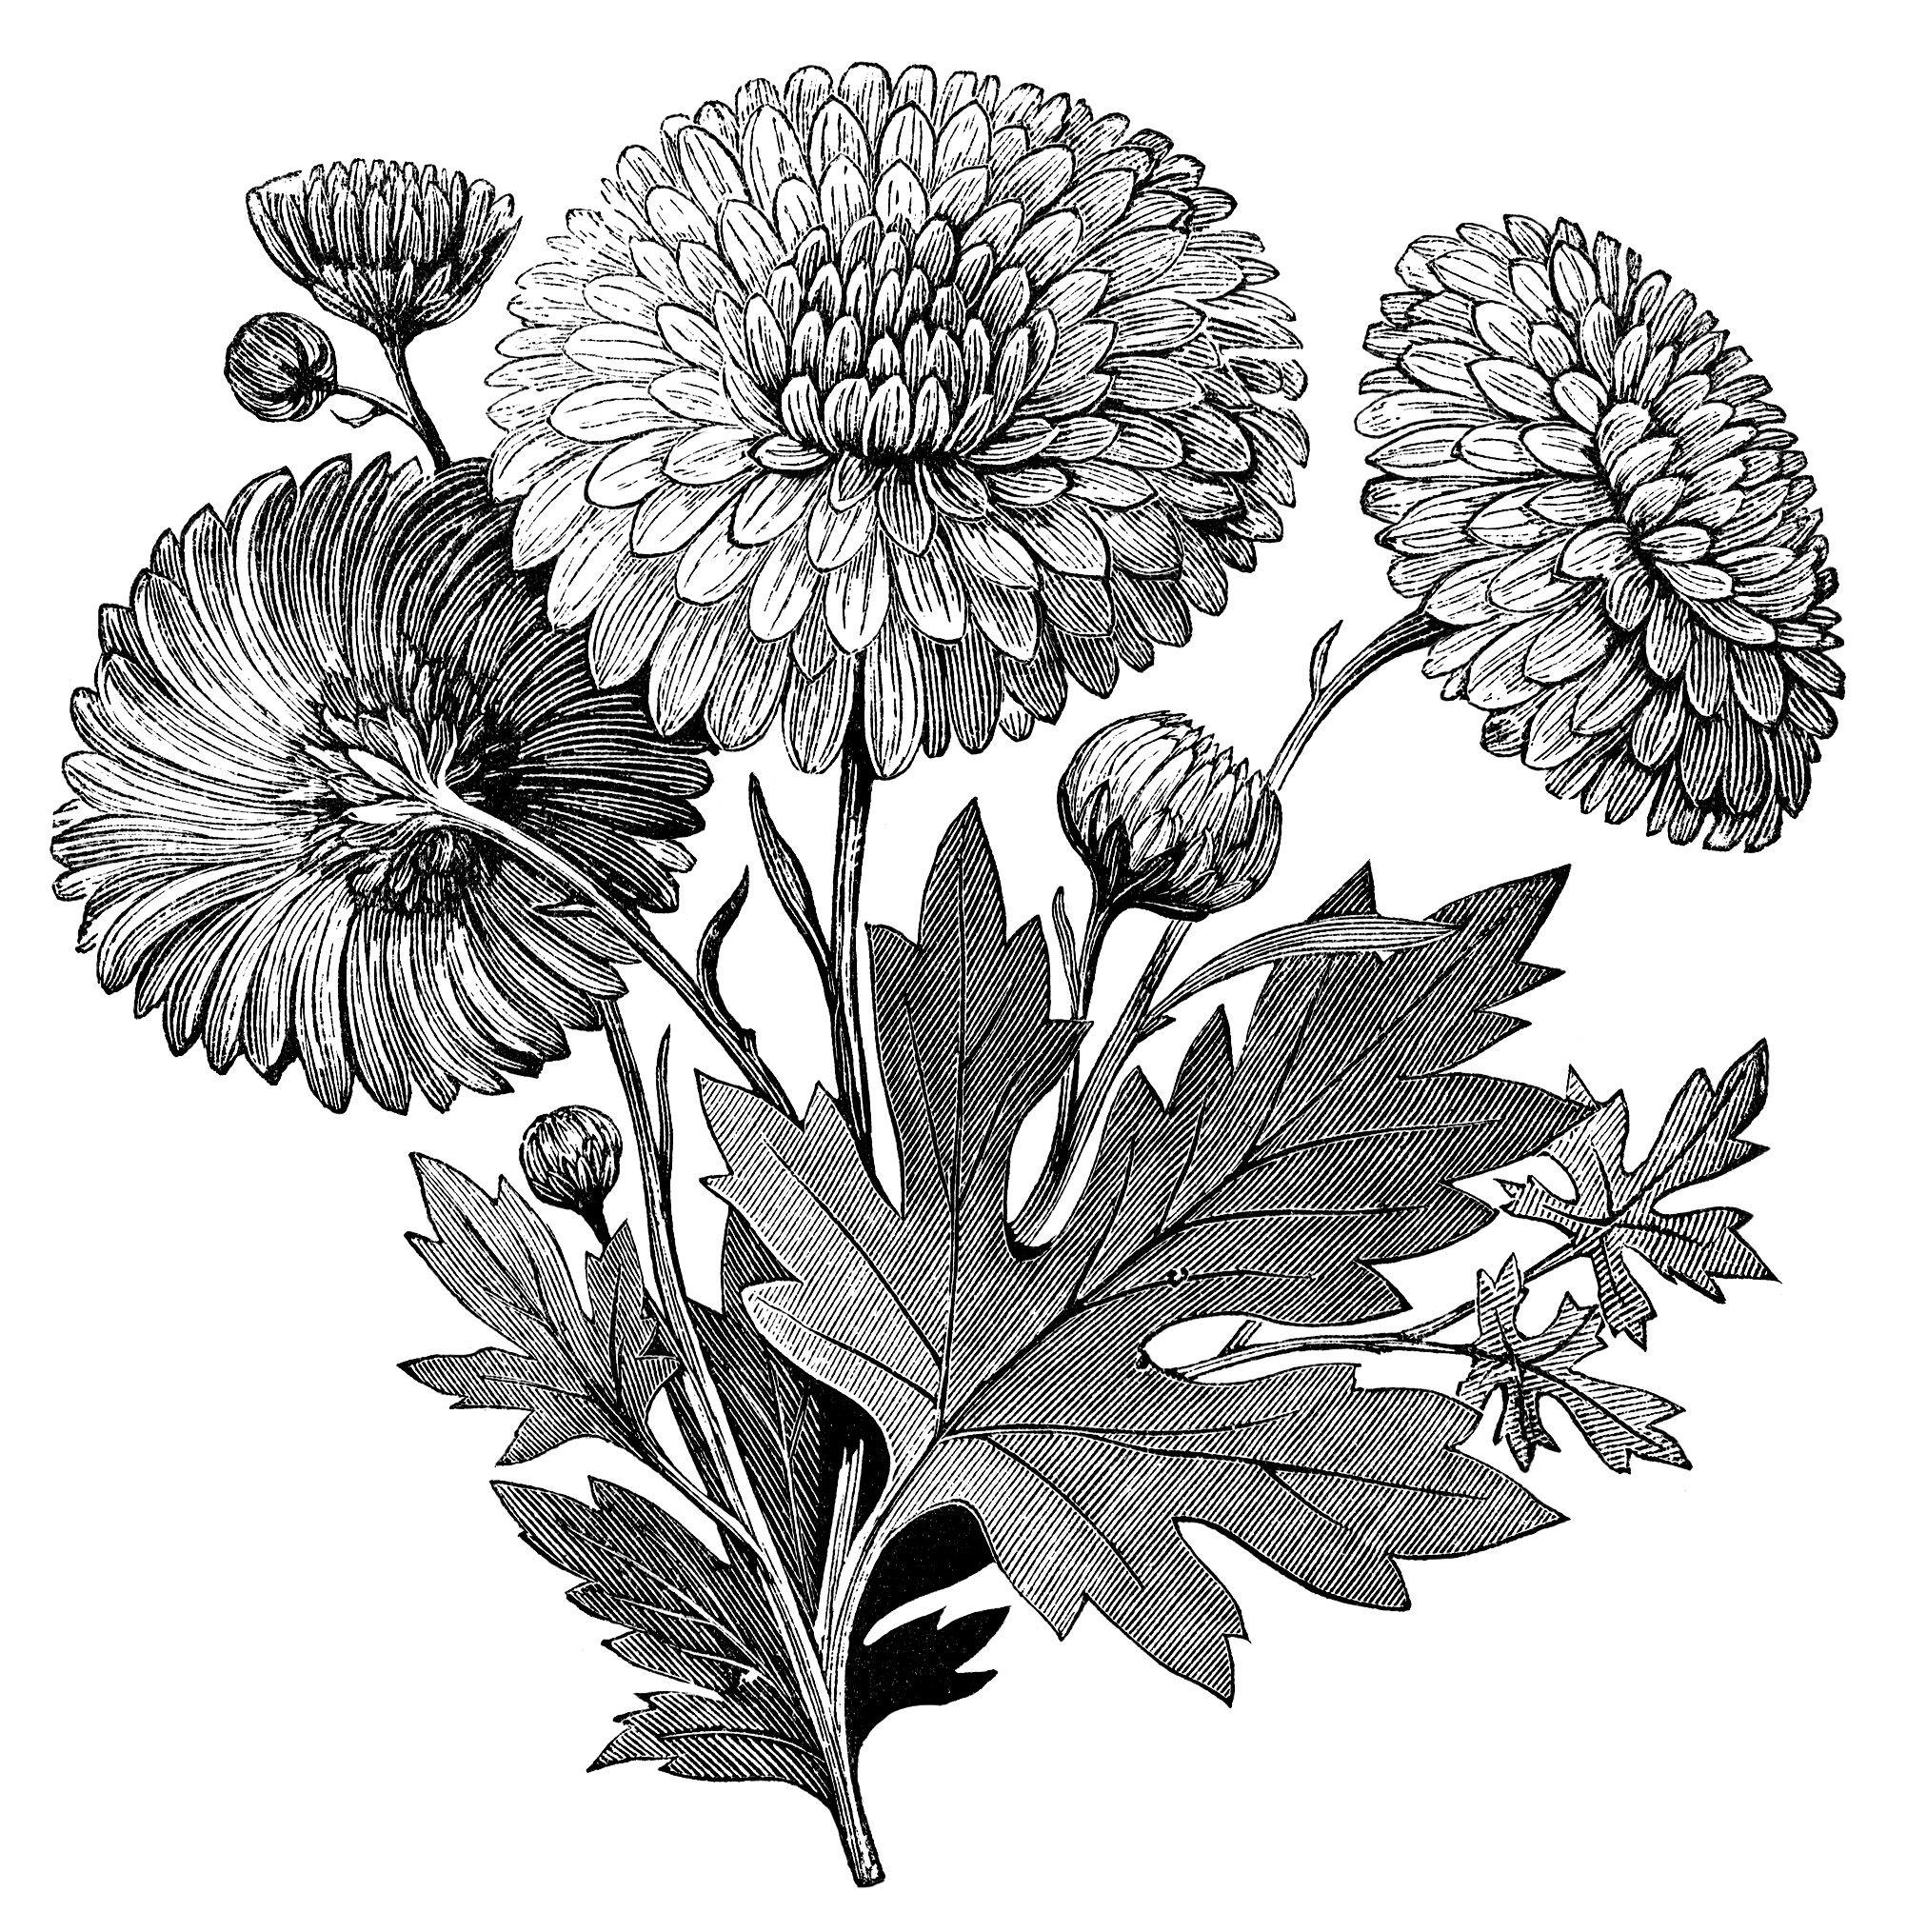 Vintage flower clipart early flowering chrysanthemum chrysanthemum